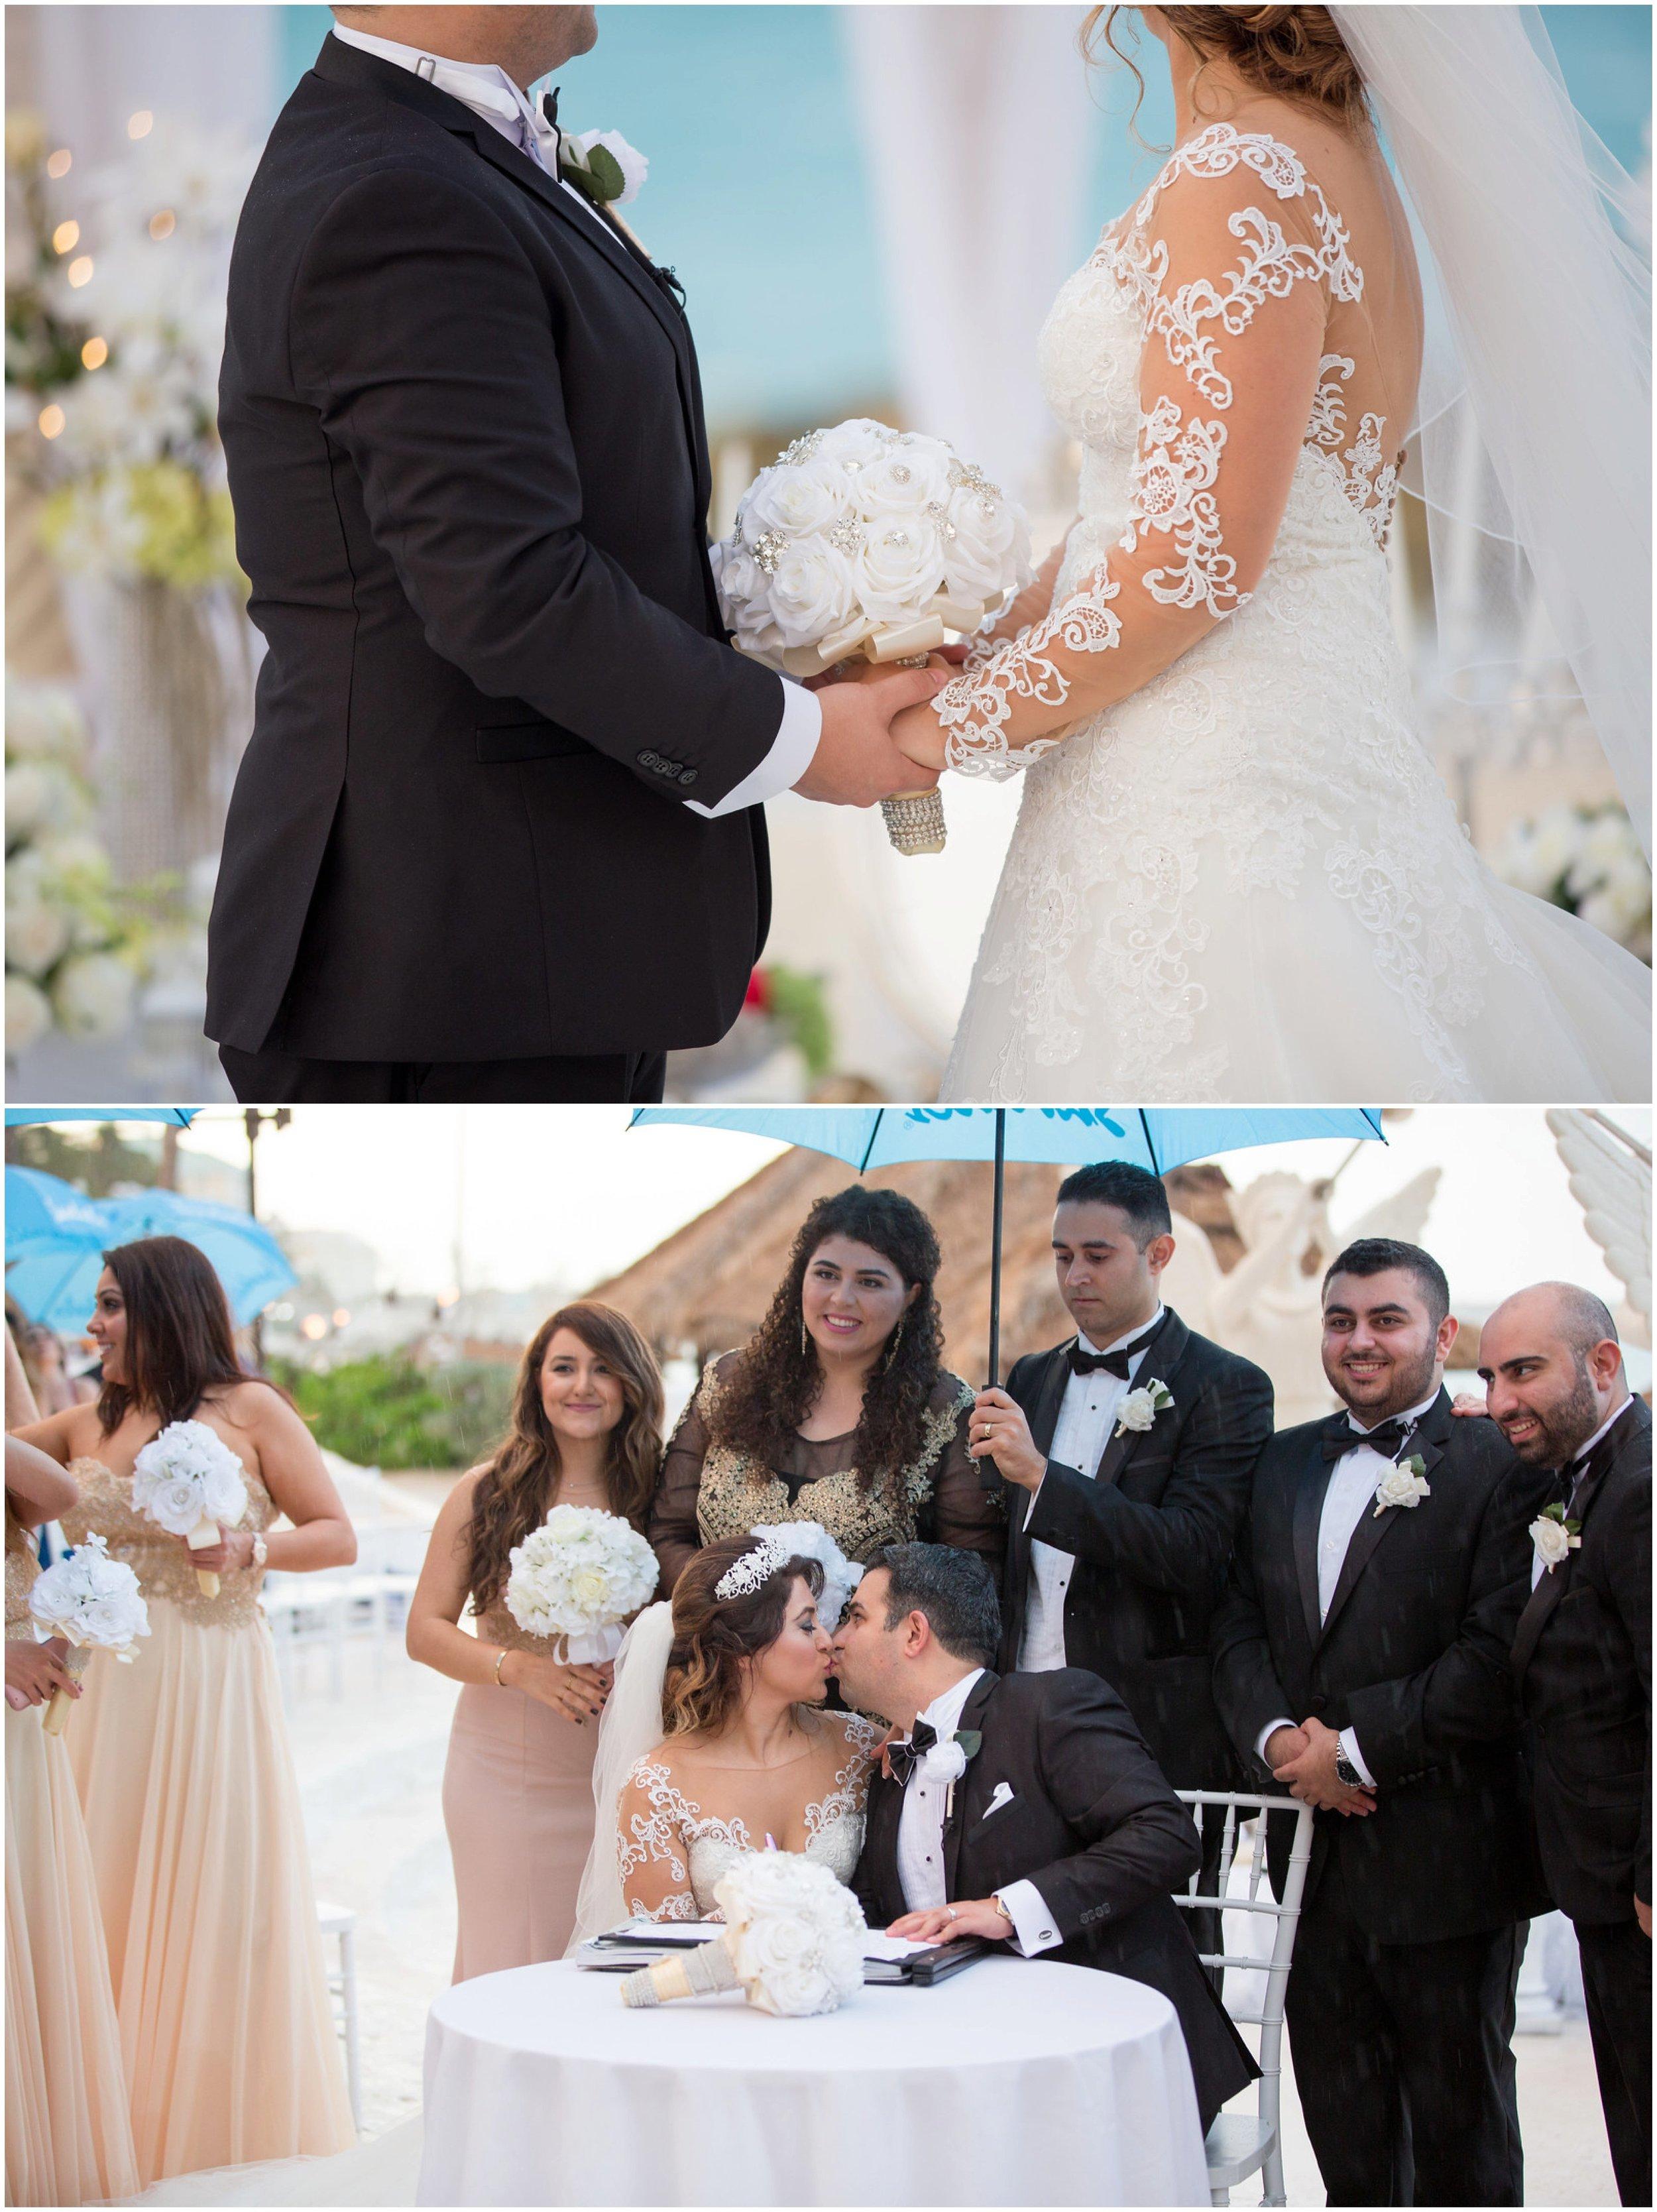 Le Cape Weddings- Destination Wedding Photography -ShayanandNikkie-427-X3_LuxuryDestinationPhotographer.jpg